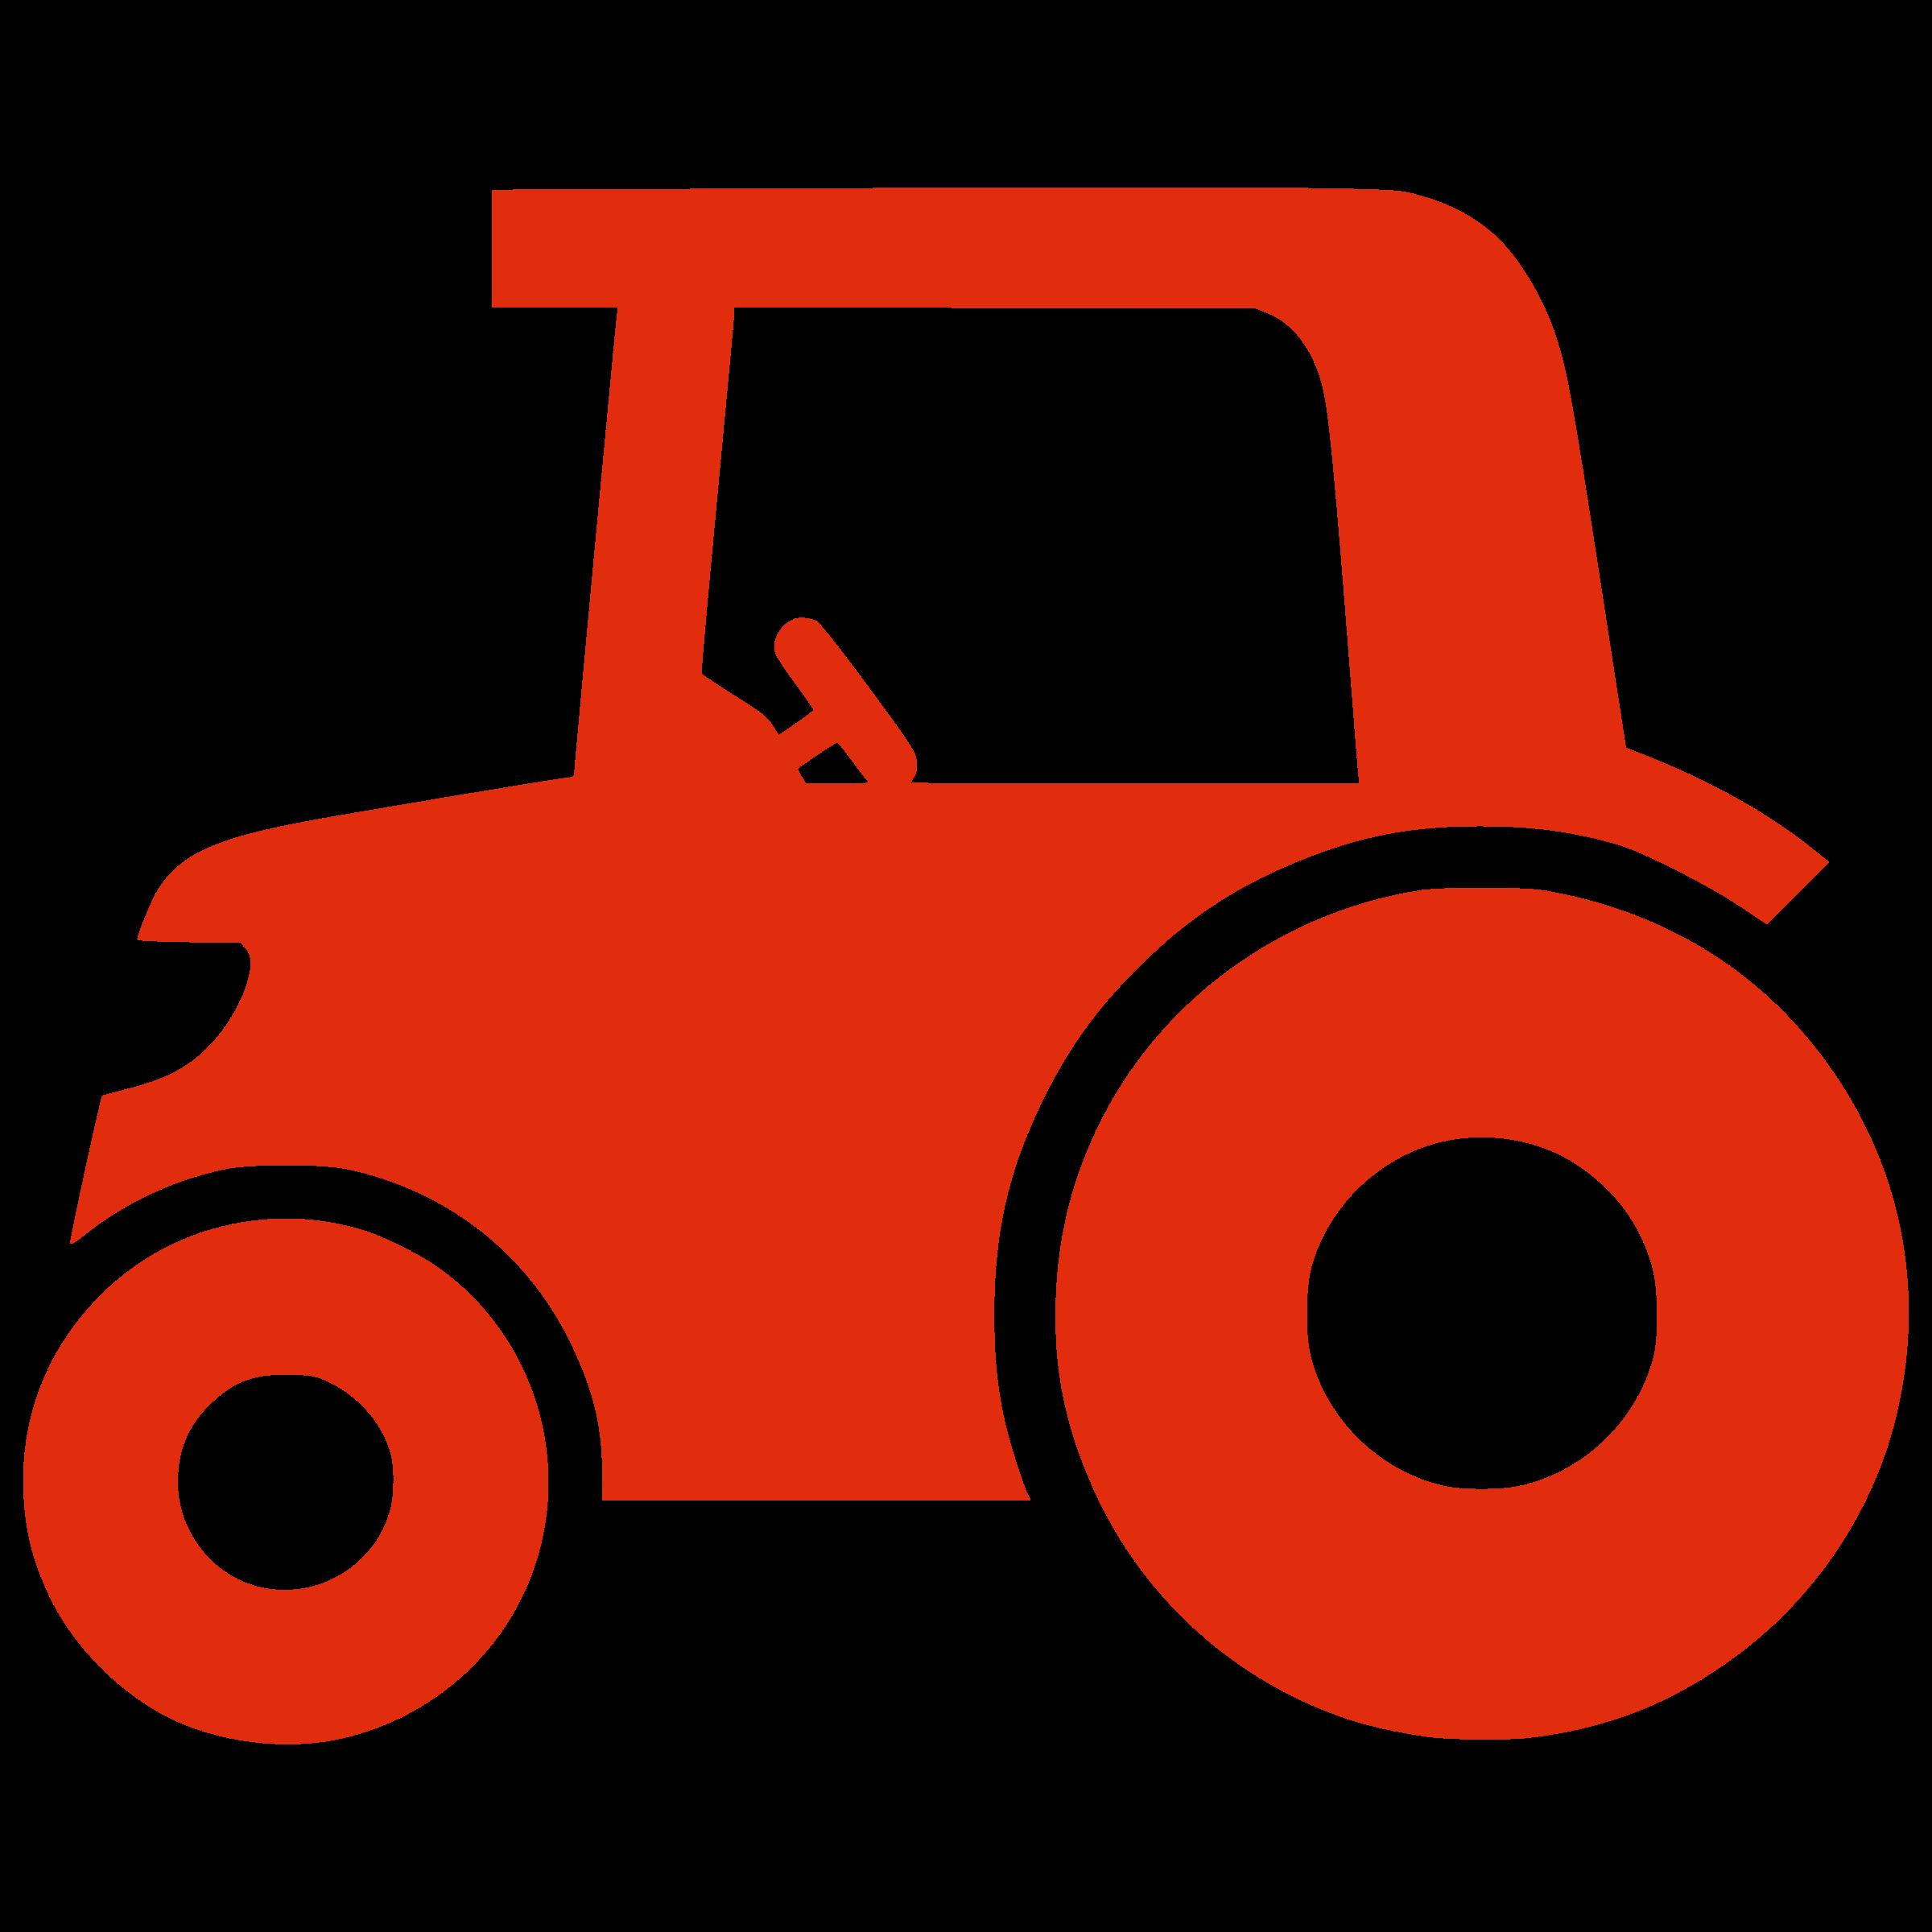 2400x2400 Tractor Silhouette Clip Art For Free 101 Clip Art